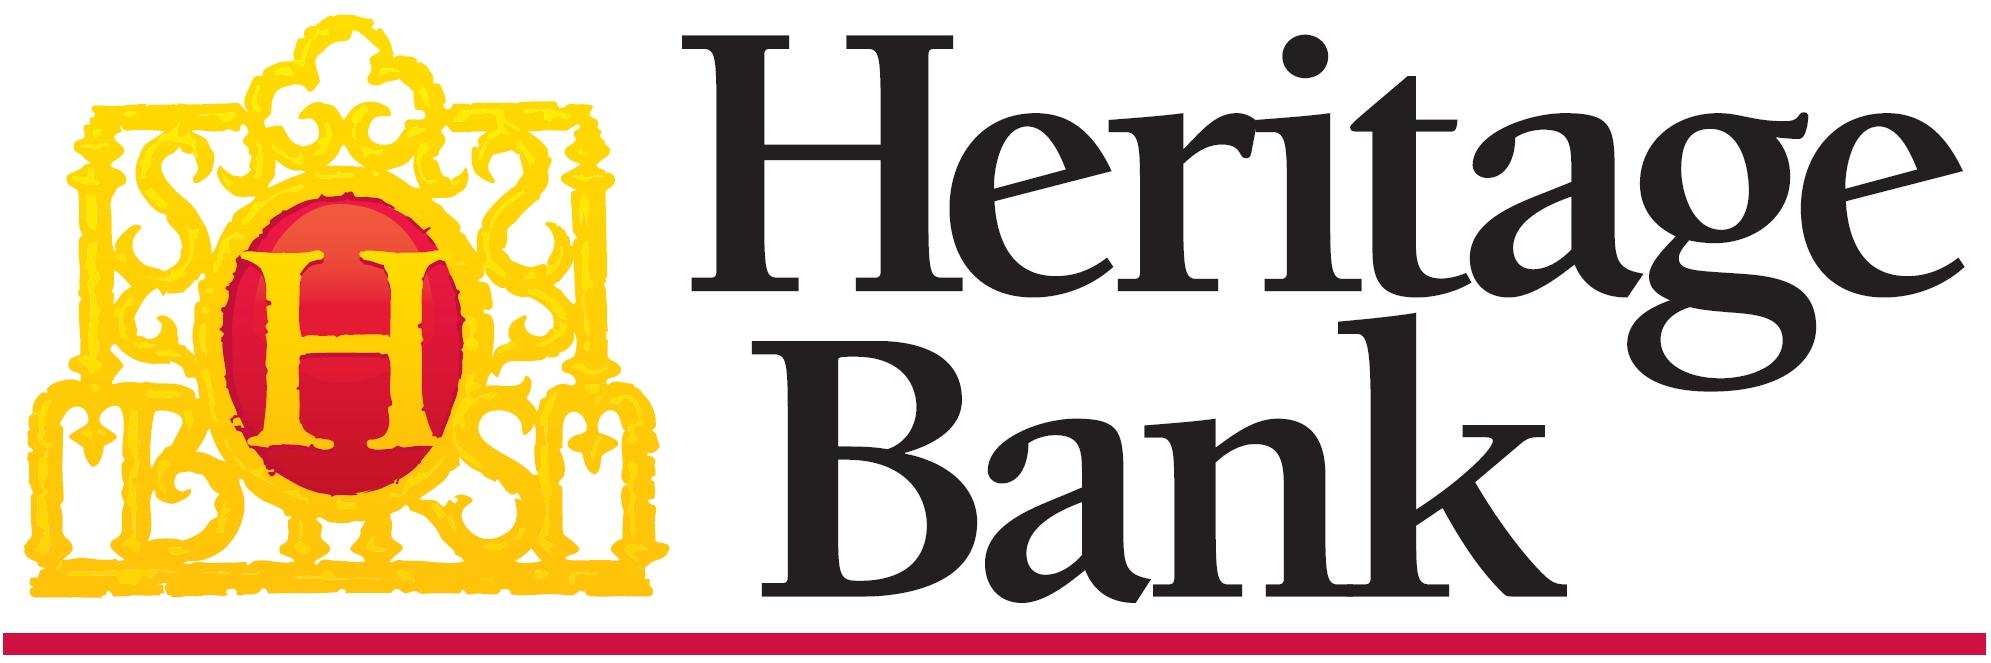 Heritage Bank - Toowoomba, QLD 4350 - (07) 4633 0300 | ShowMeLocal.com